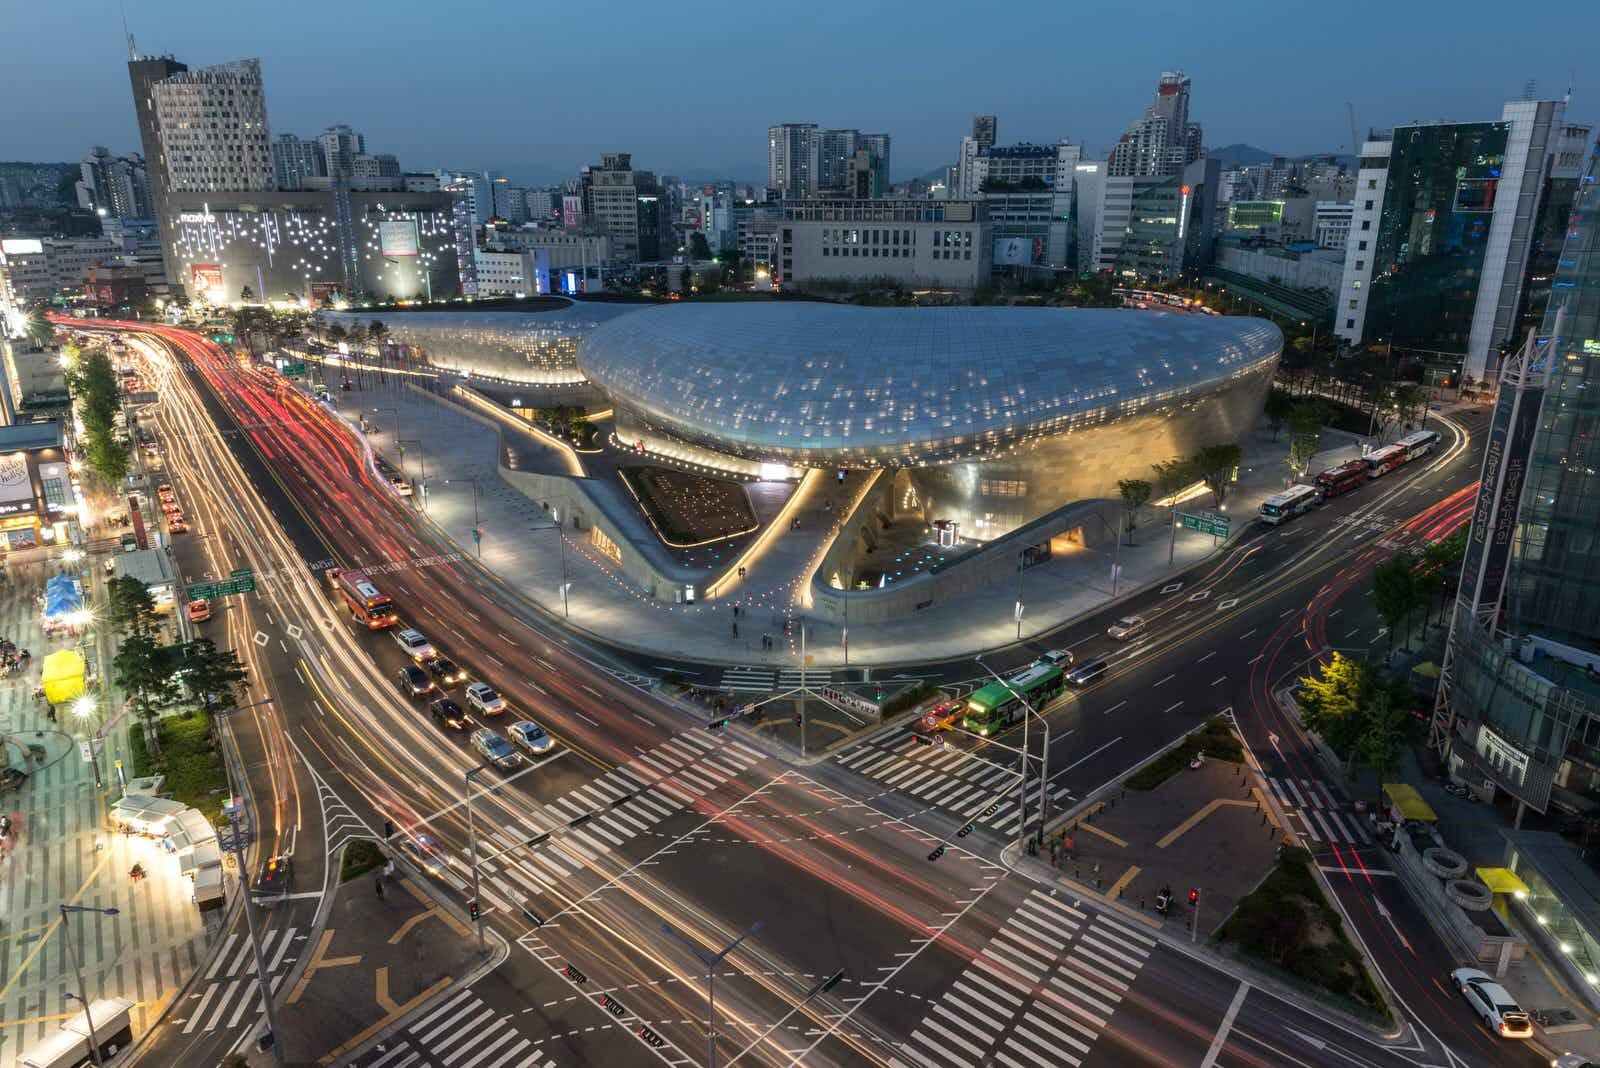 Seoul's dynamic cityscape: an architectural tour through the South Korean capital